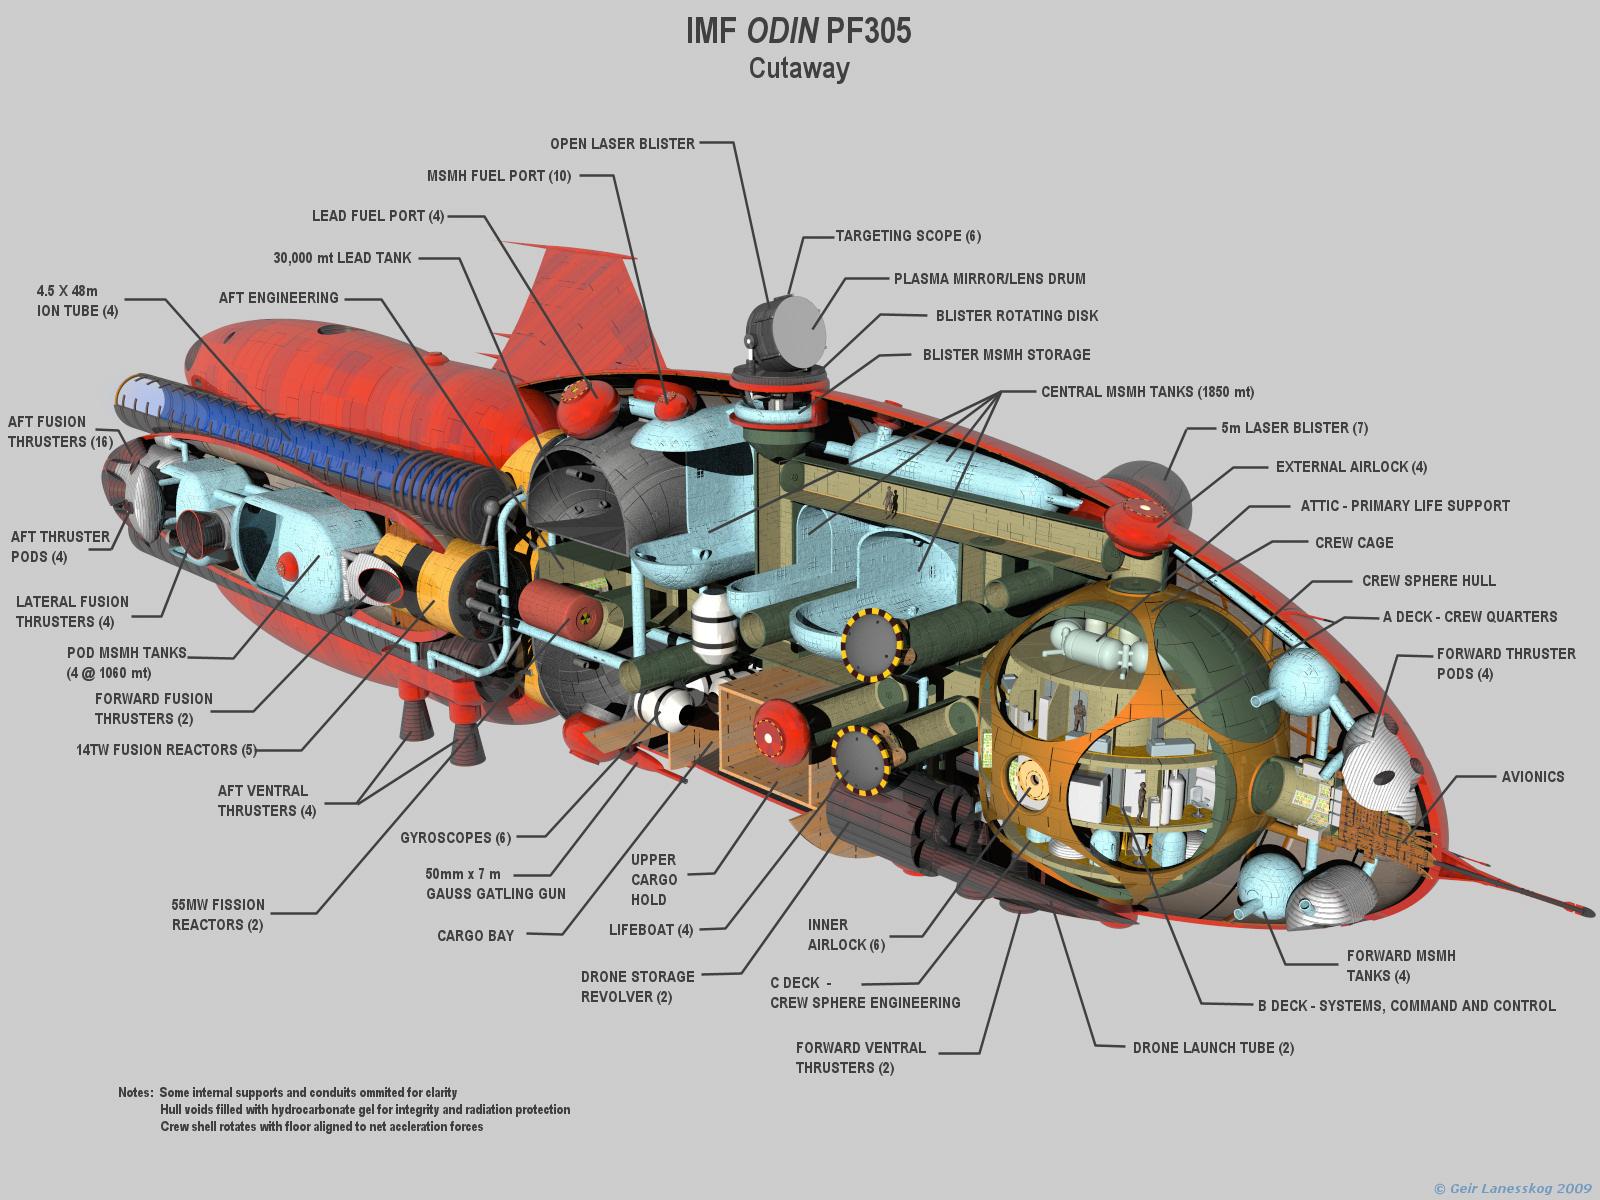 Odin Cutaway Annotated Veyron W16 Engine Diagram Odincutawayannotated